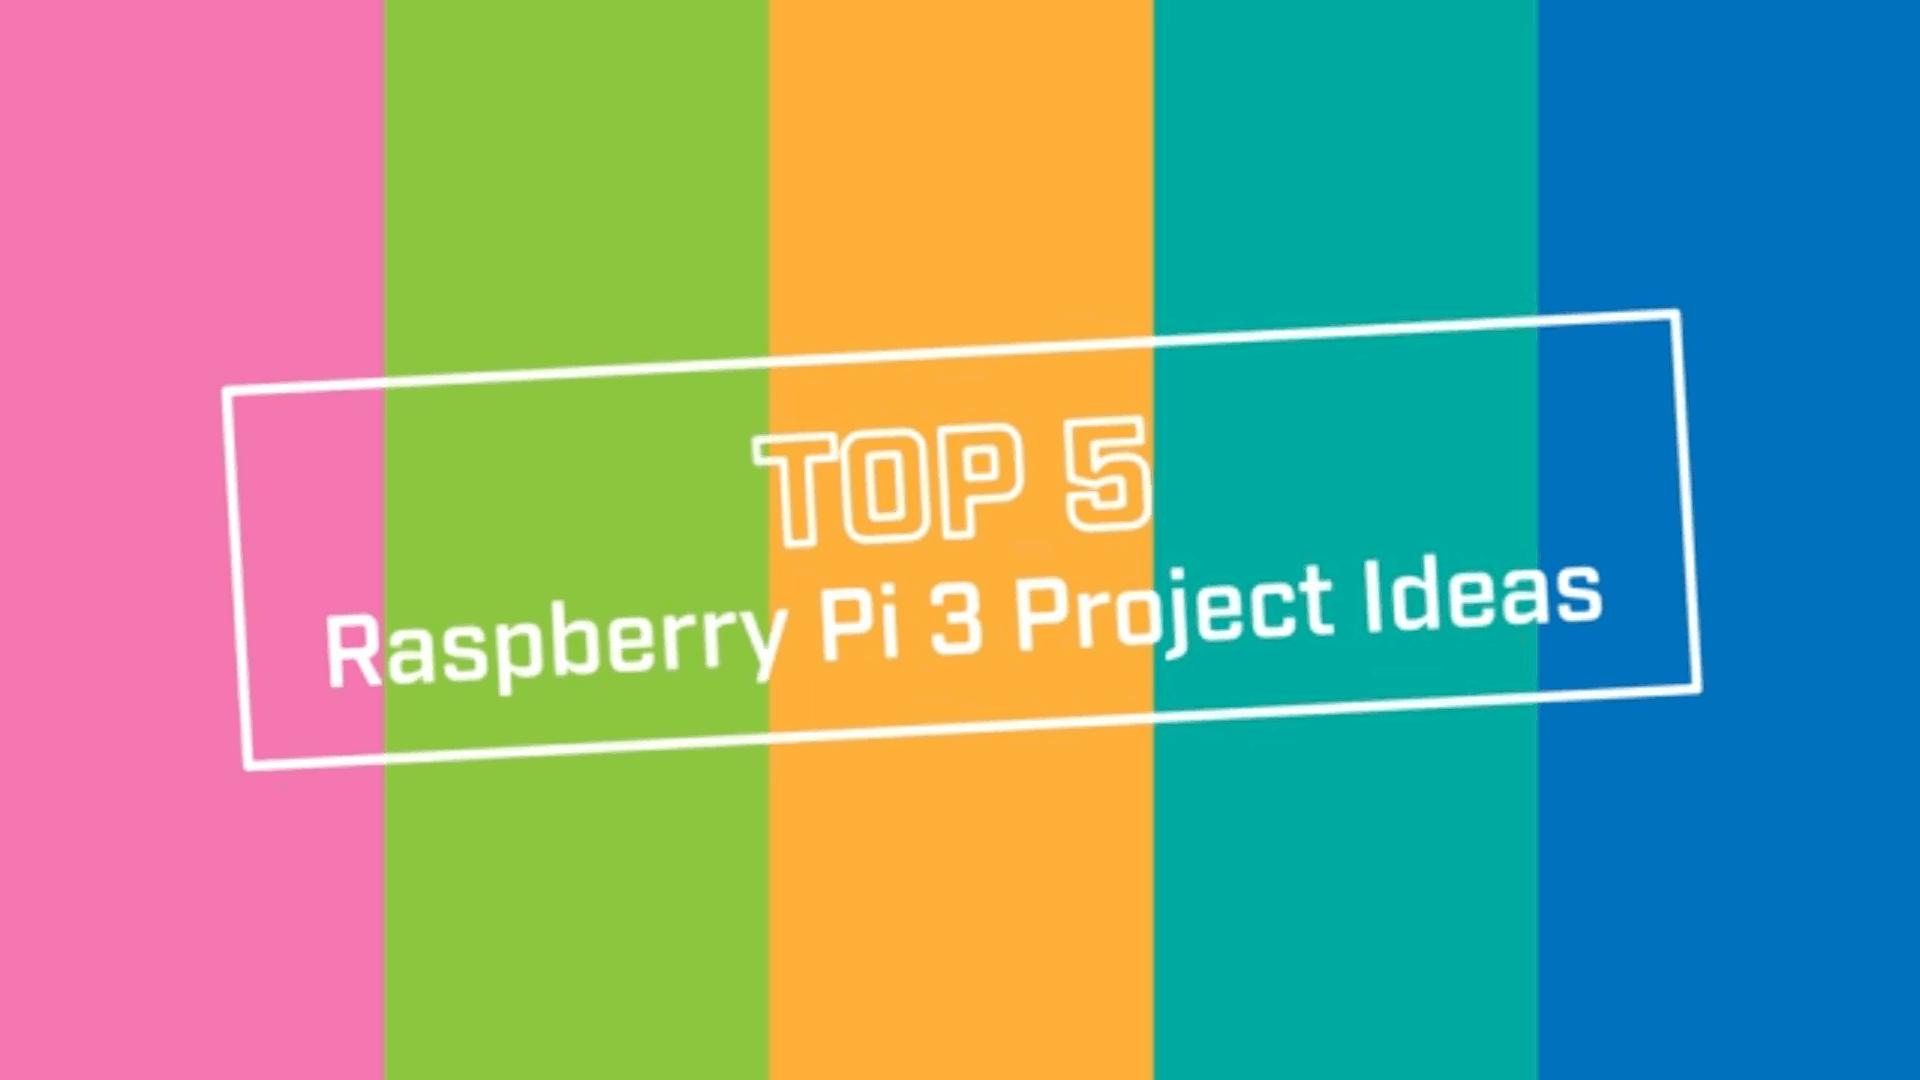 Extreem Top 5 Raspberry Pi 3 Project Ideas - Raspberry Pi Spy AH43